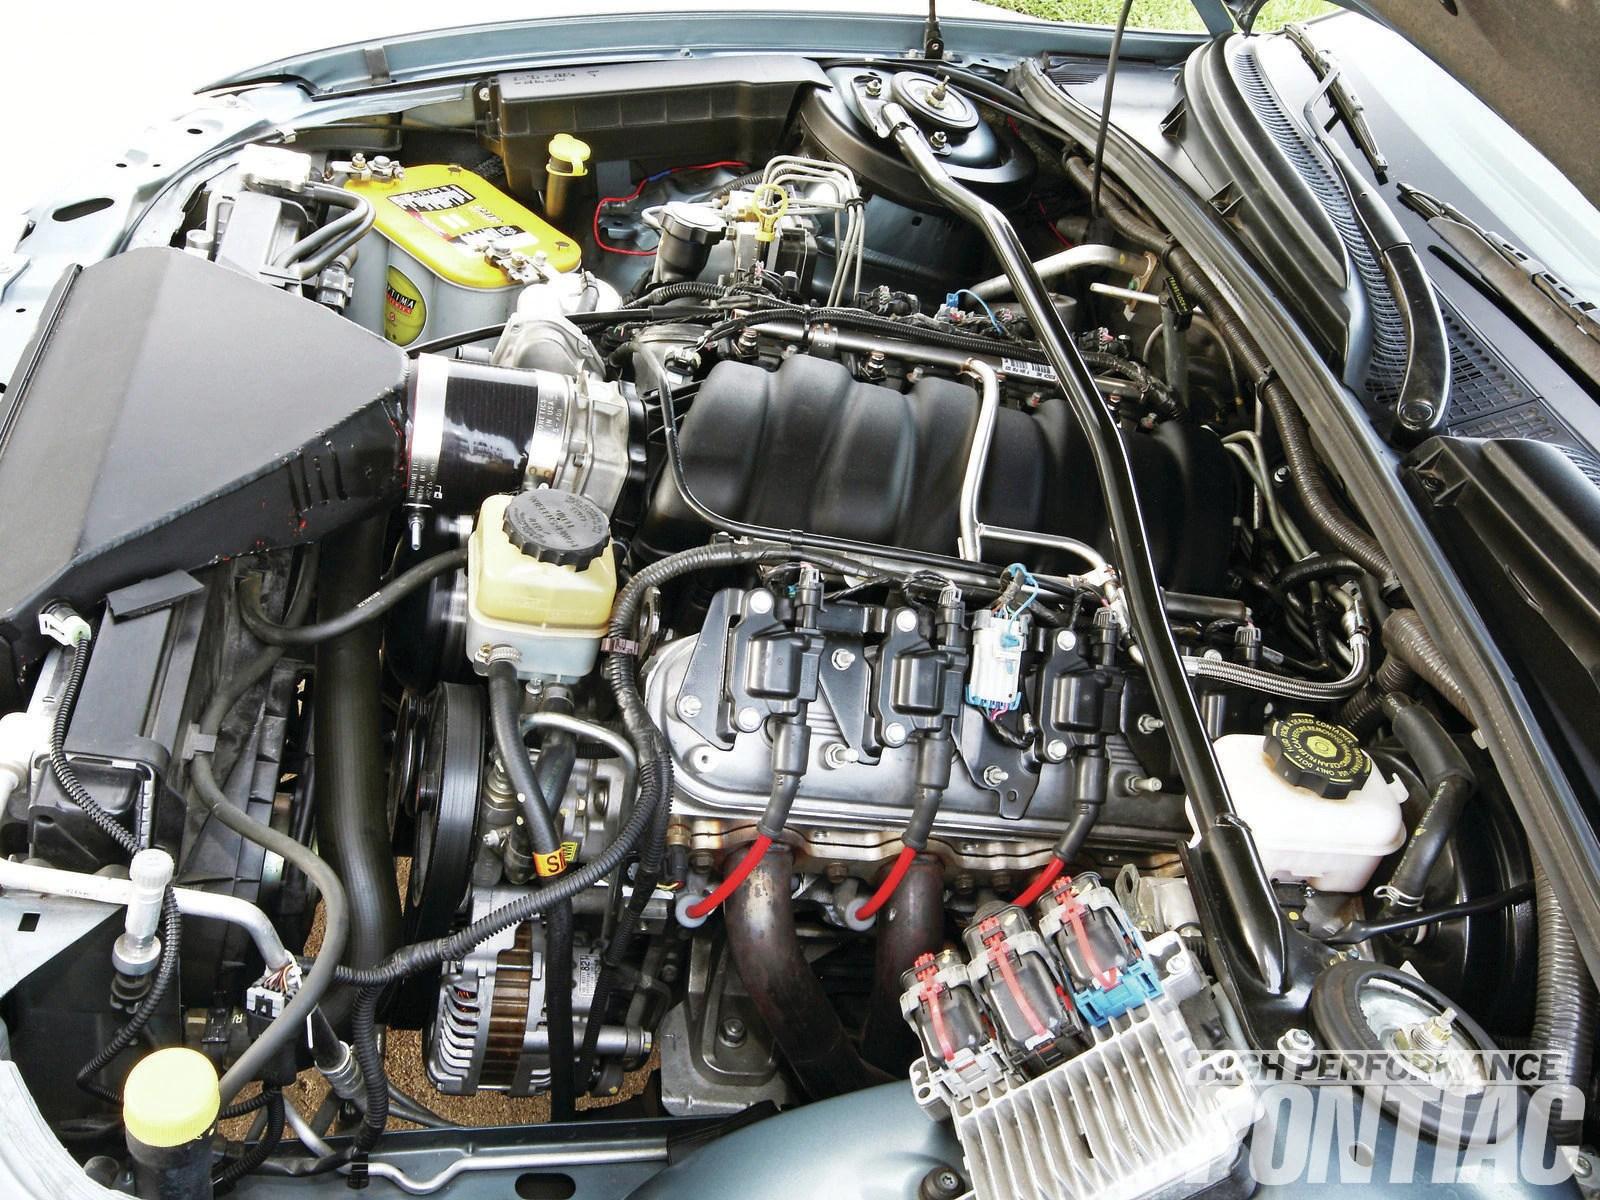 medium resolution of wiring diagram for 1967 pontiac gto wiring library 2006 2005 gto 1967 pontiac gto engine diagram